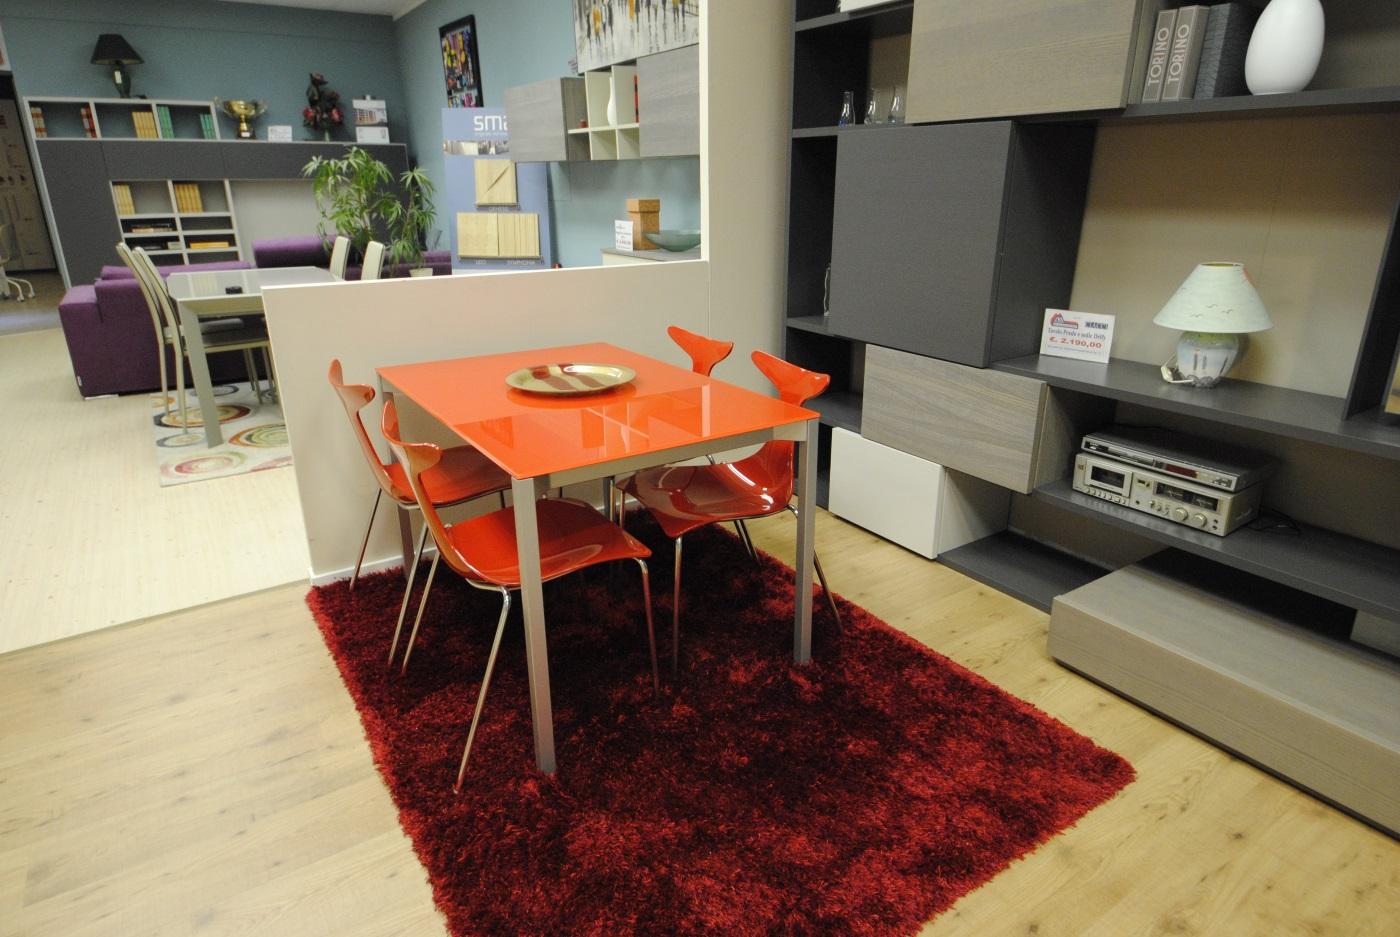 Offerta tavolo ciacci mod prado e sedie delfy san gaetano